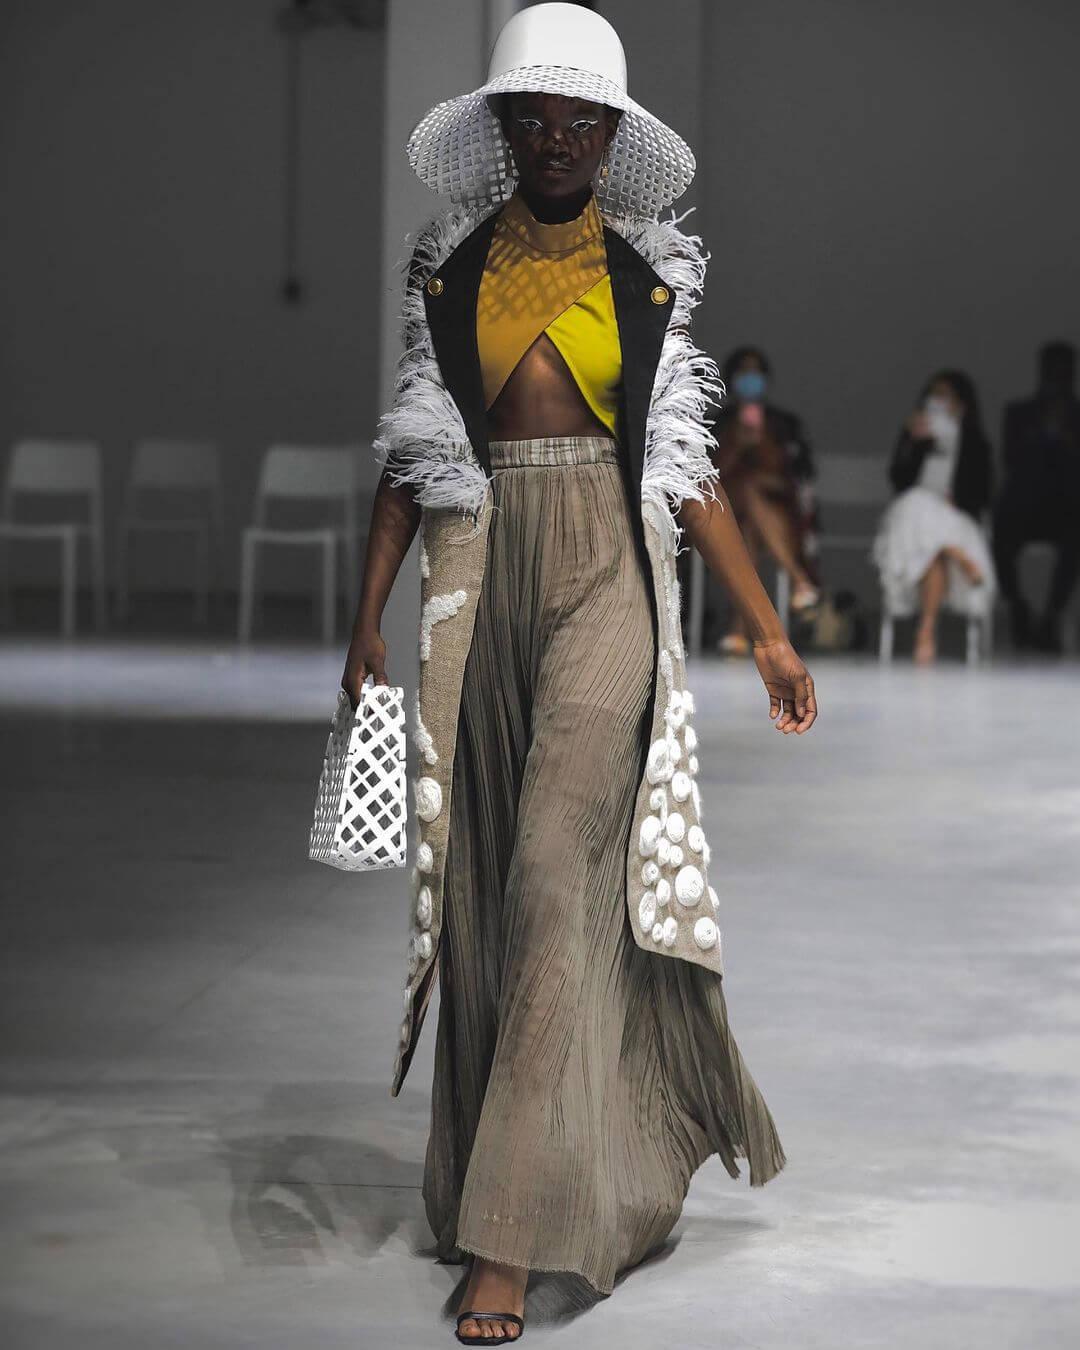 Afro Fashion Week 2021 sesta edizione Milano stilisti BIPOC | Life&People